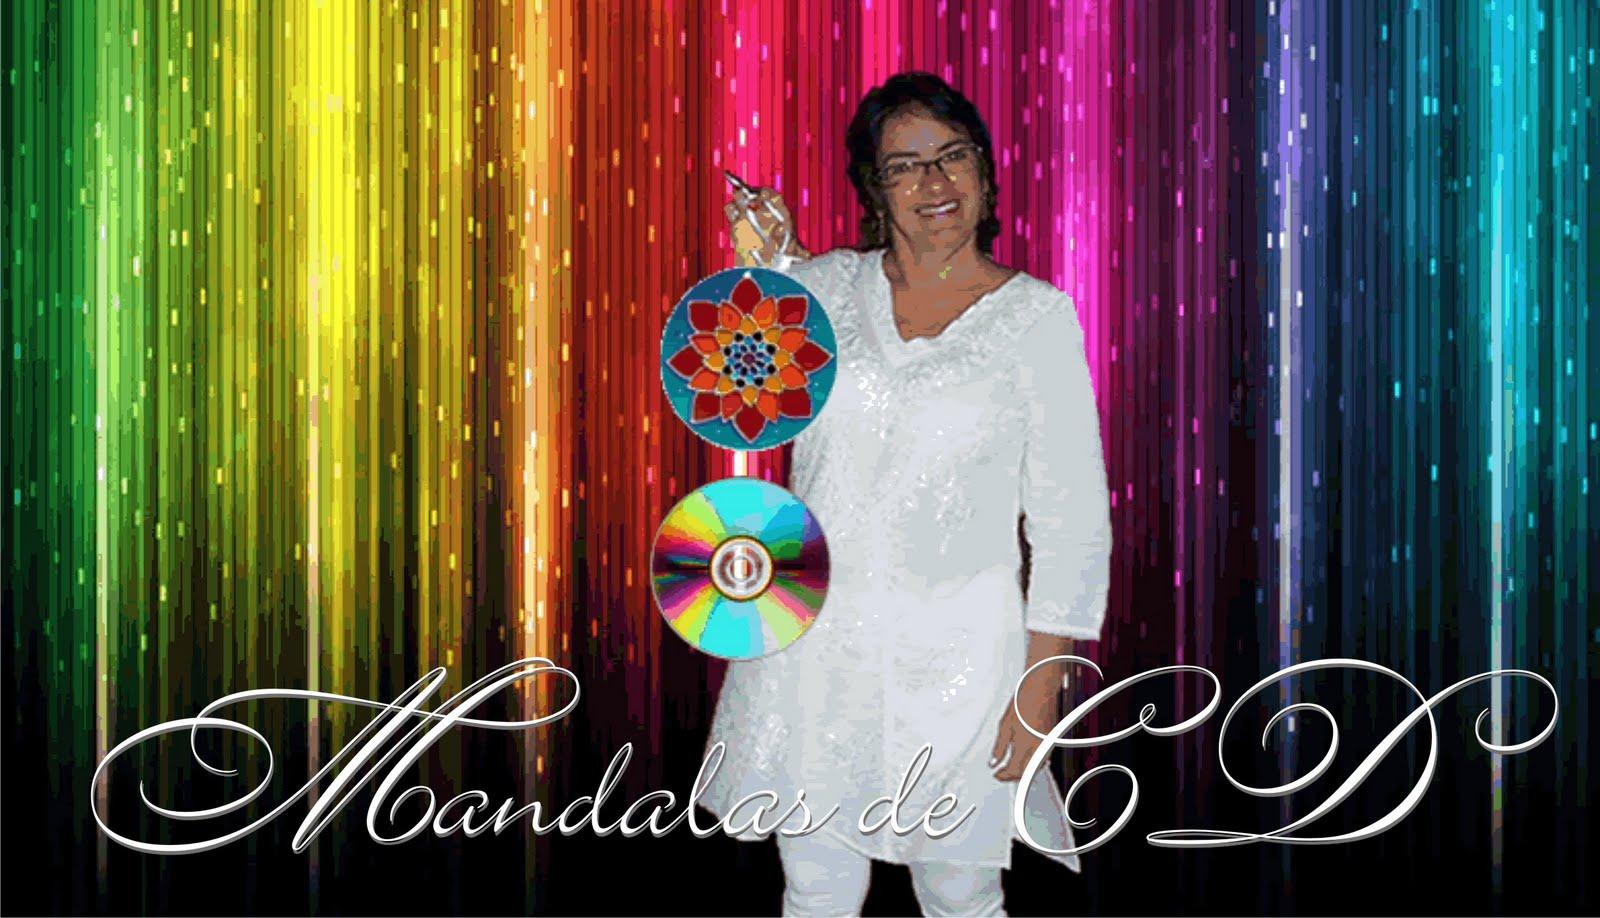 Mandalas de CD - Guidha Cappelo